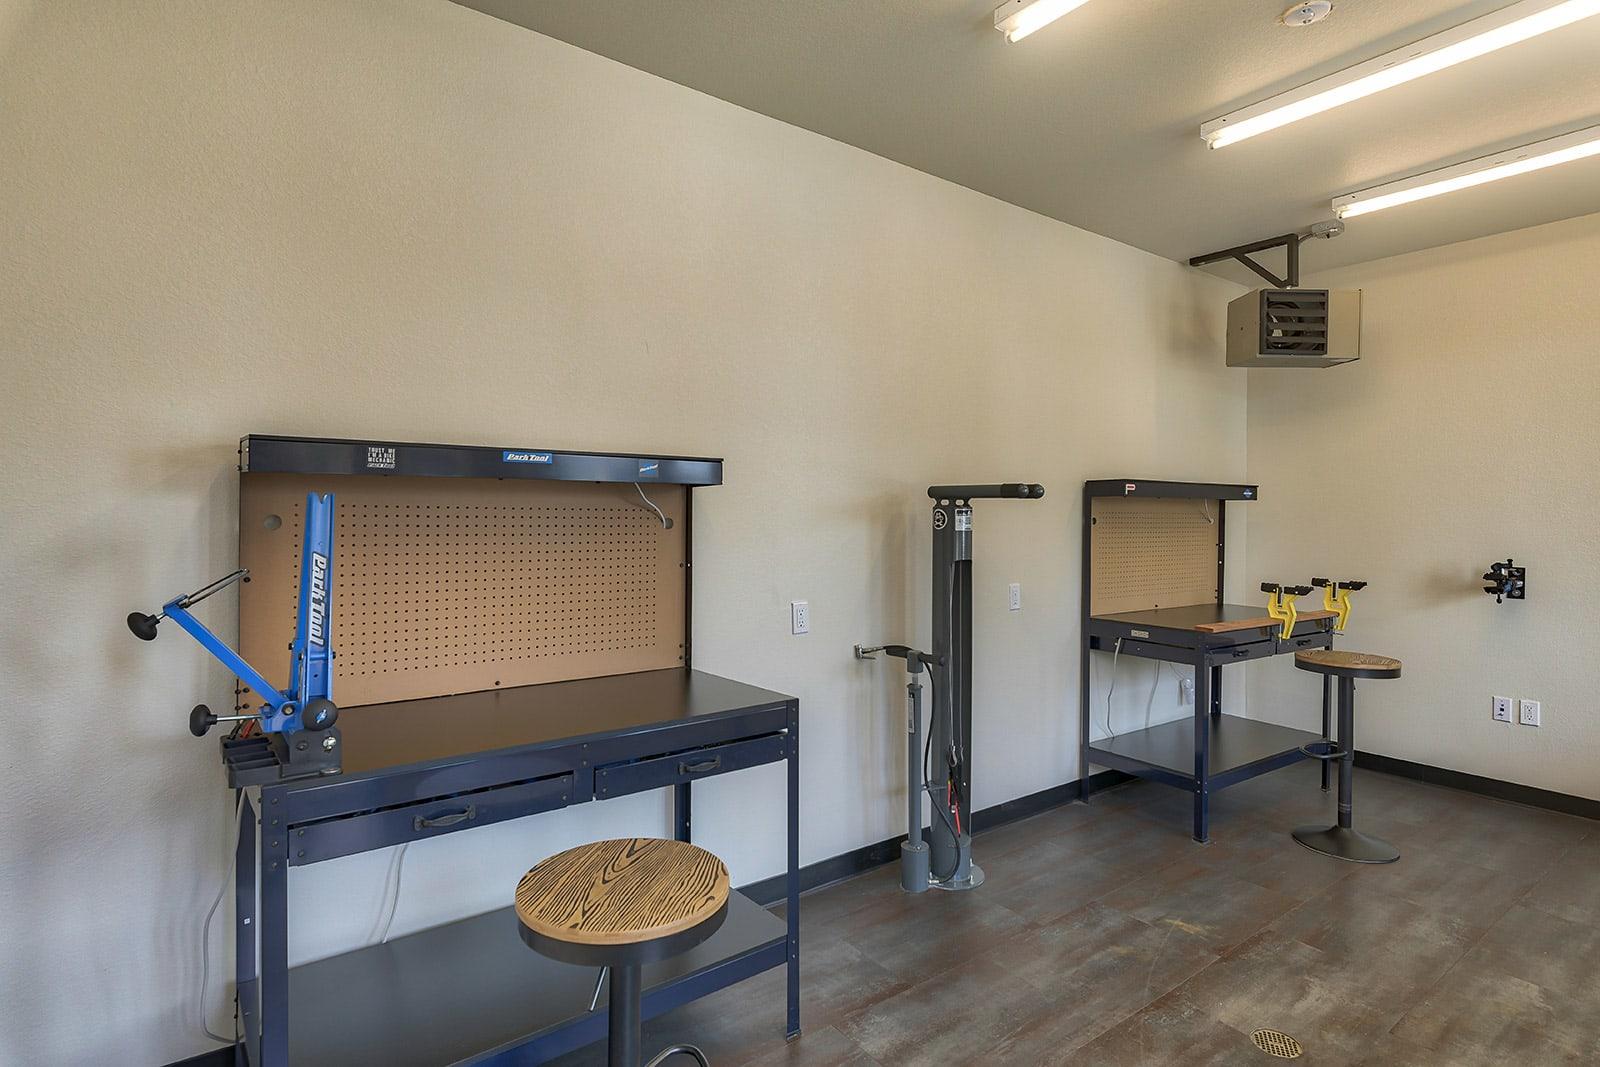 Bike repair station at Windsor at Pinehurst, CO, 80235